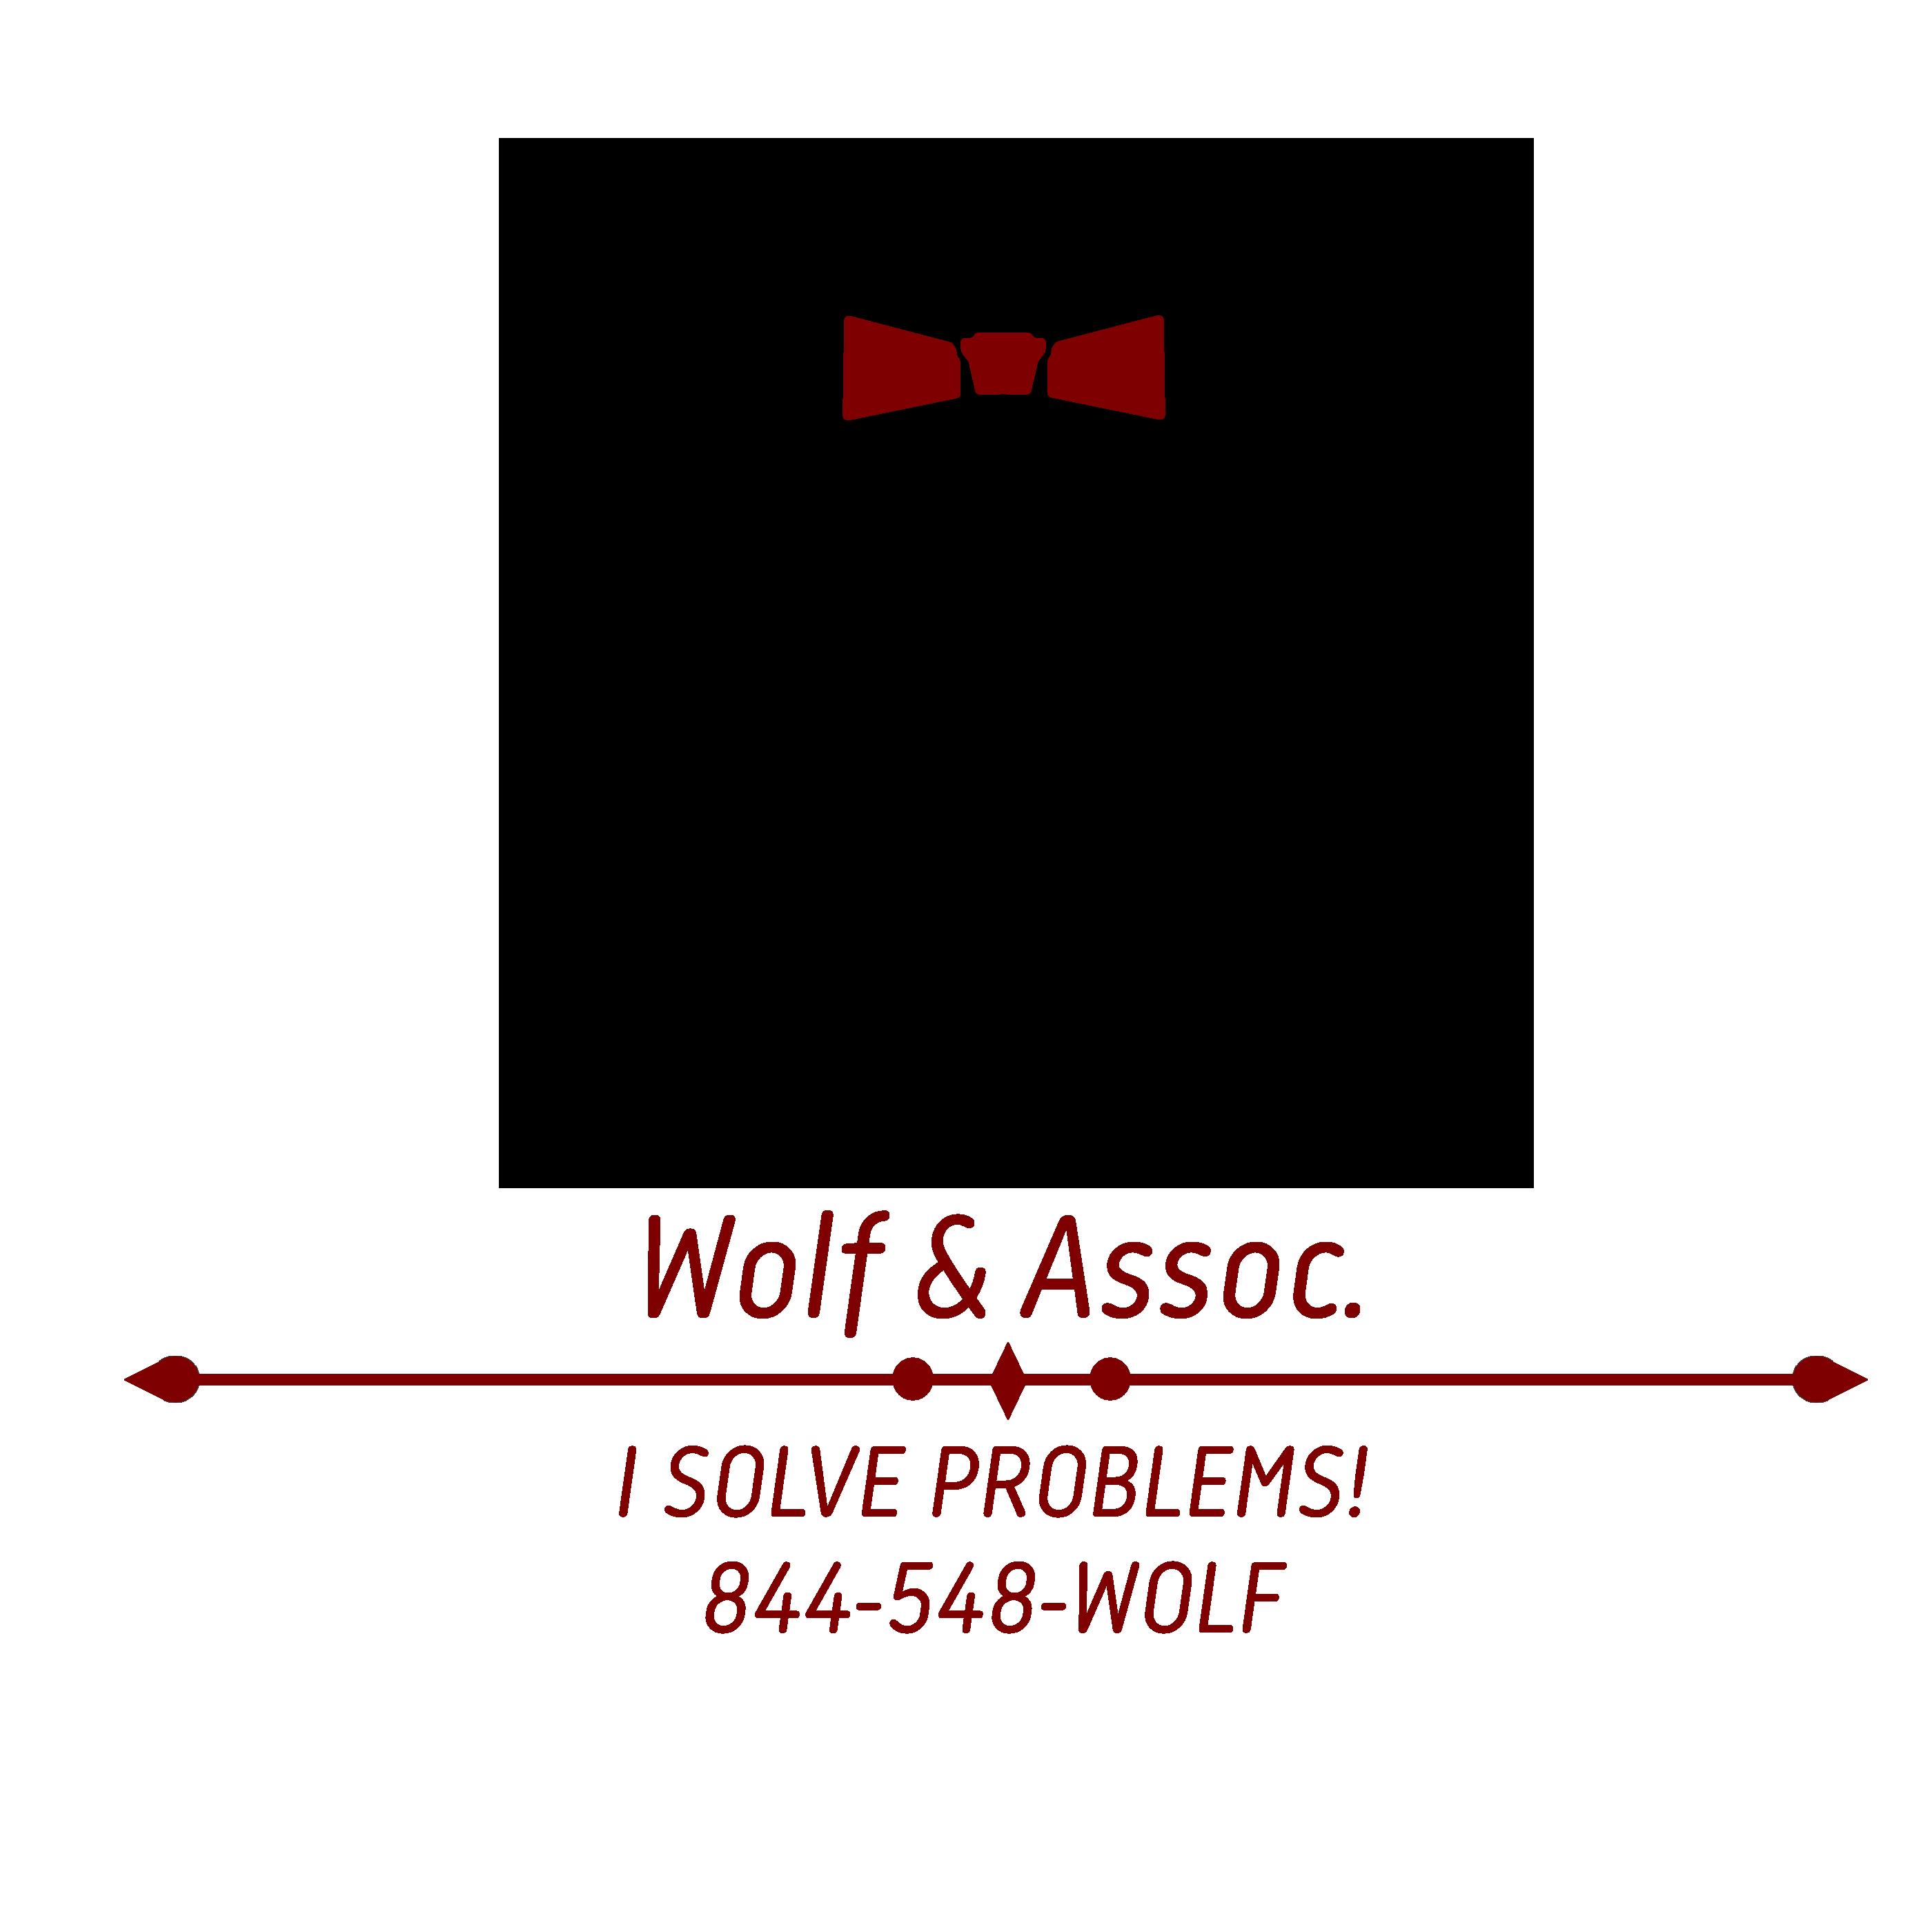 wolf-assoc-logo-2-color-1